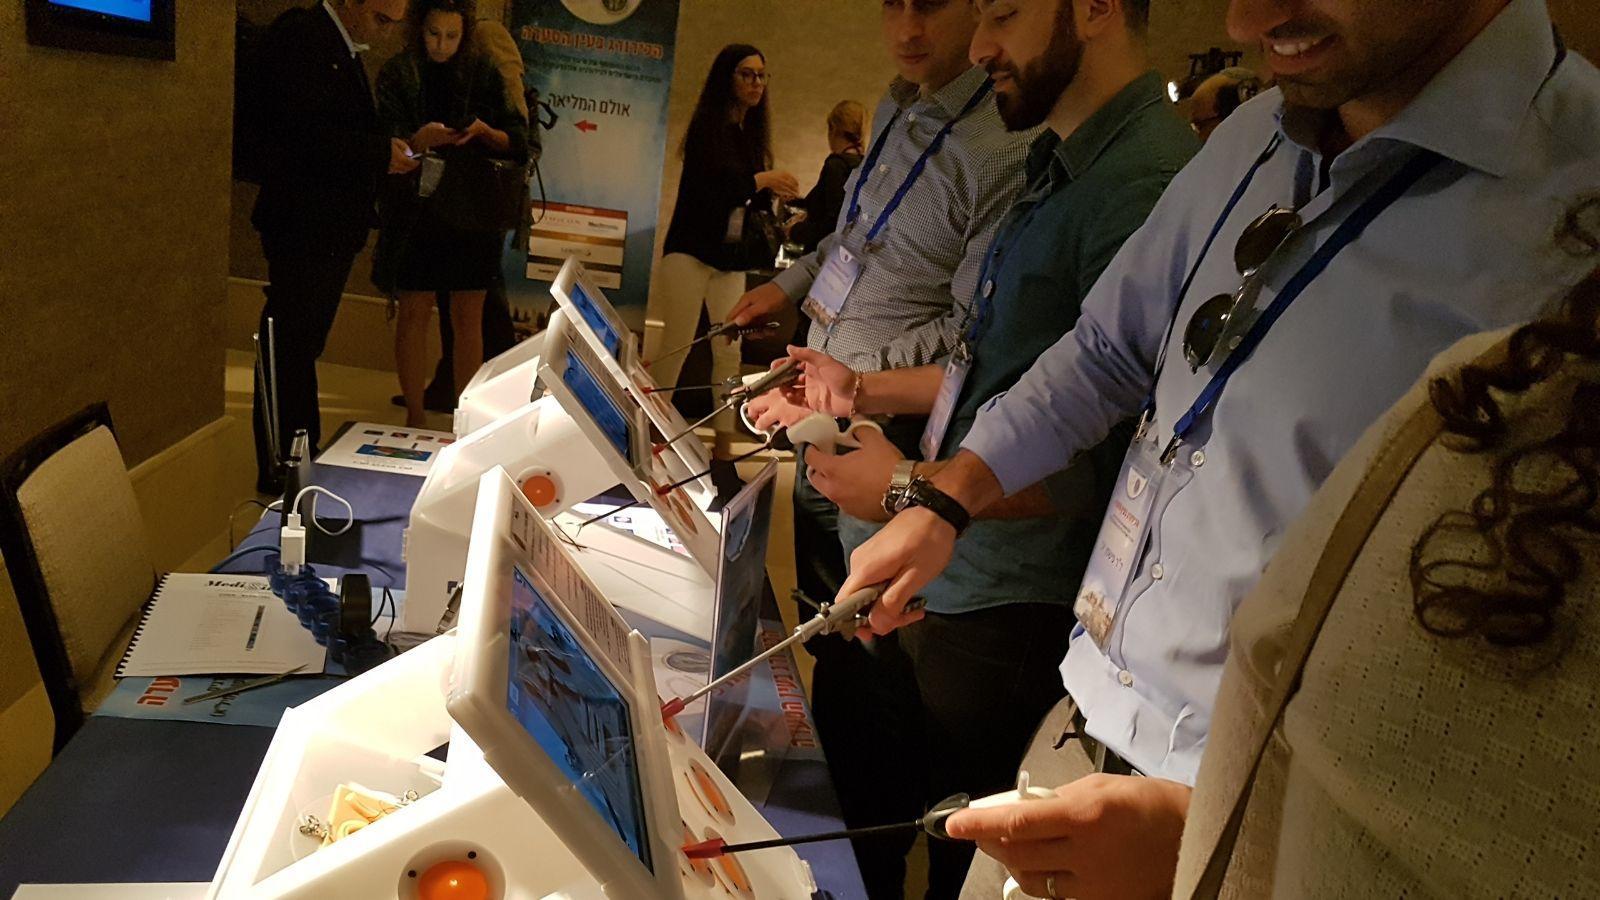 Laparoscopy Training Simulator